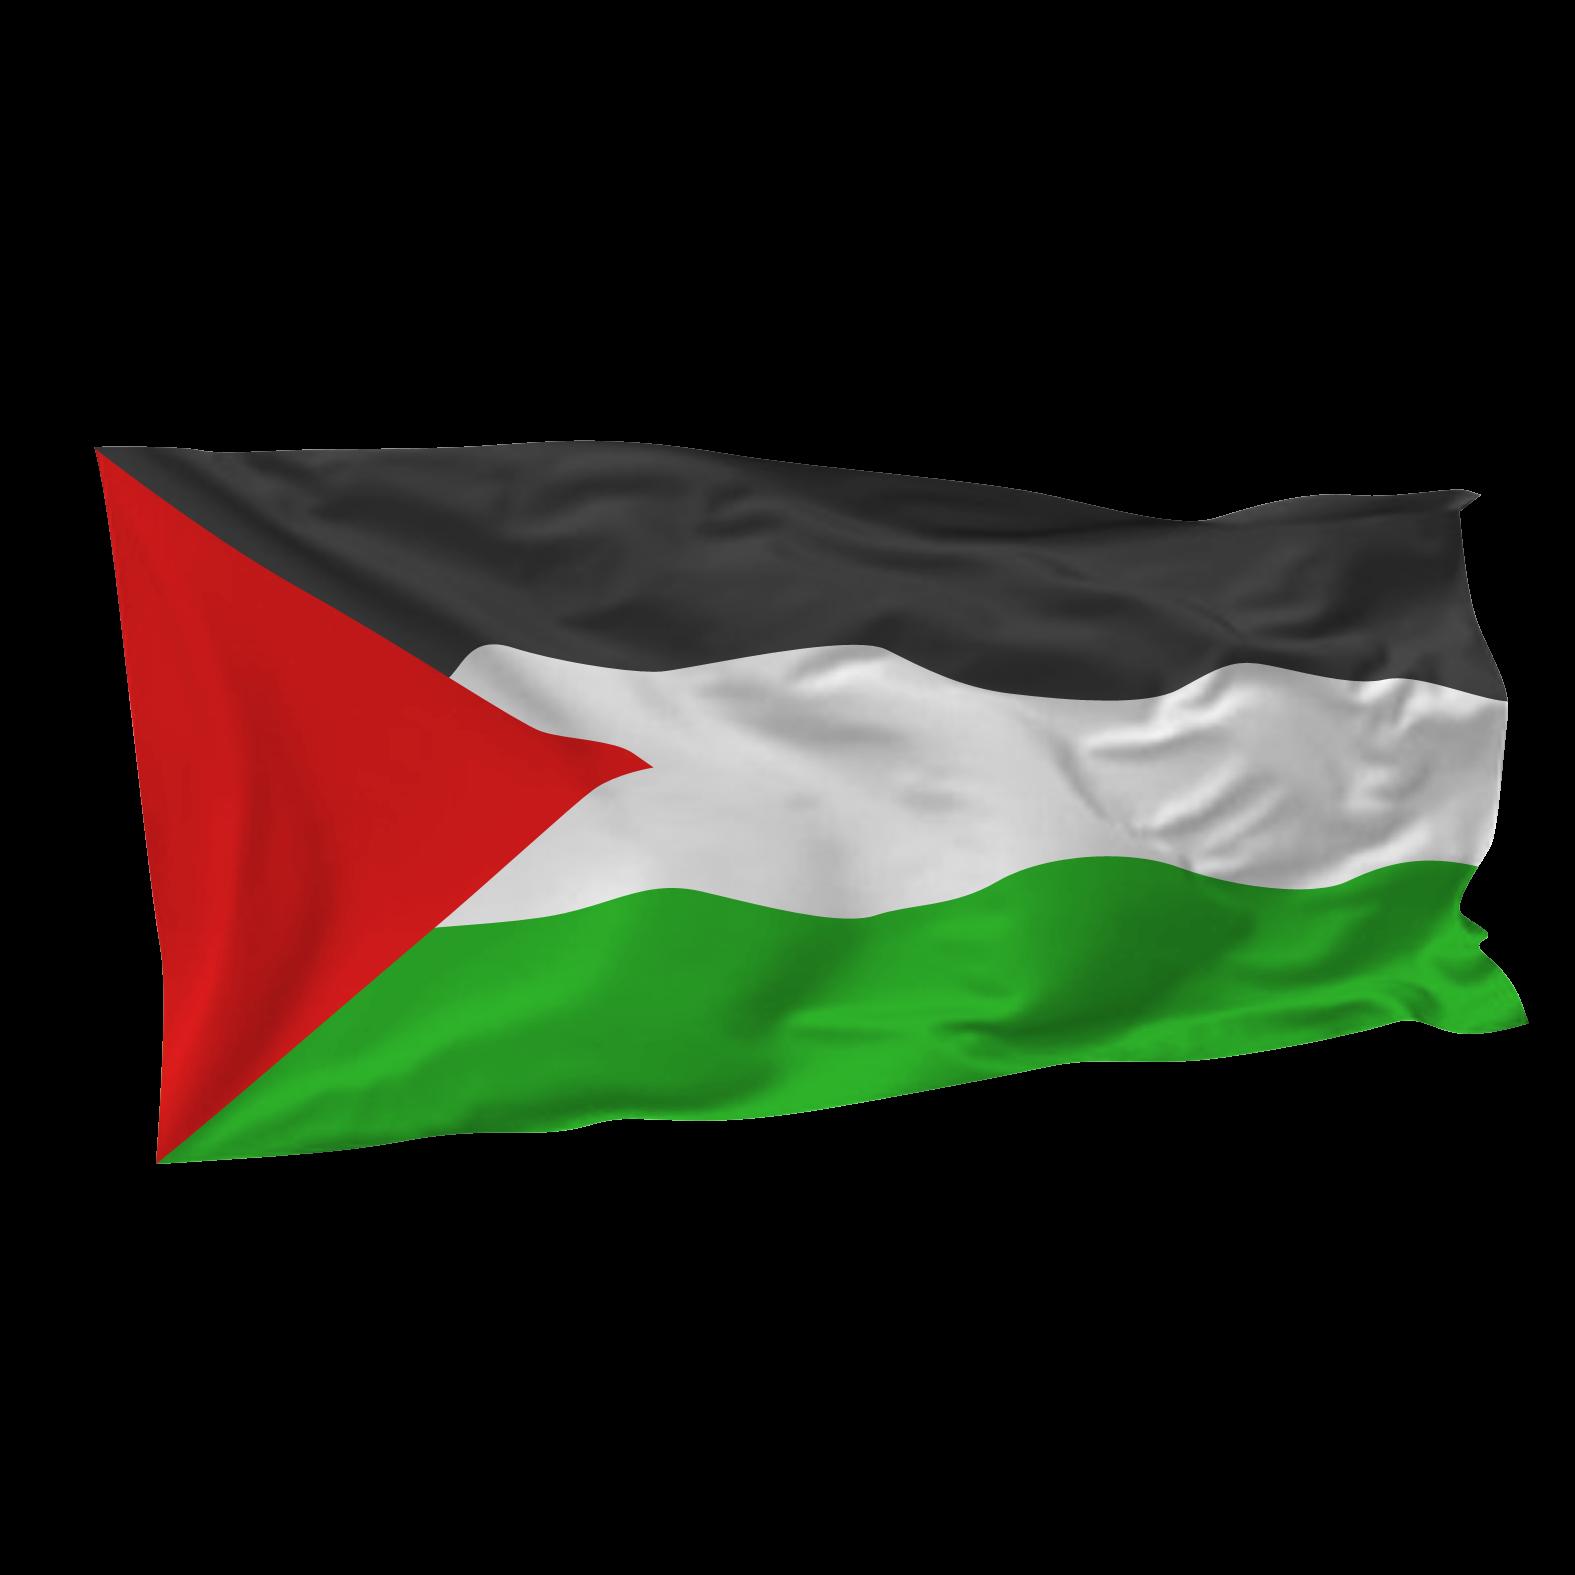 gambar bendera palestina kartun